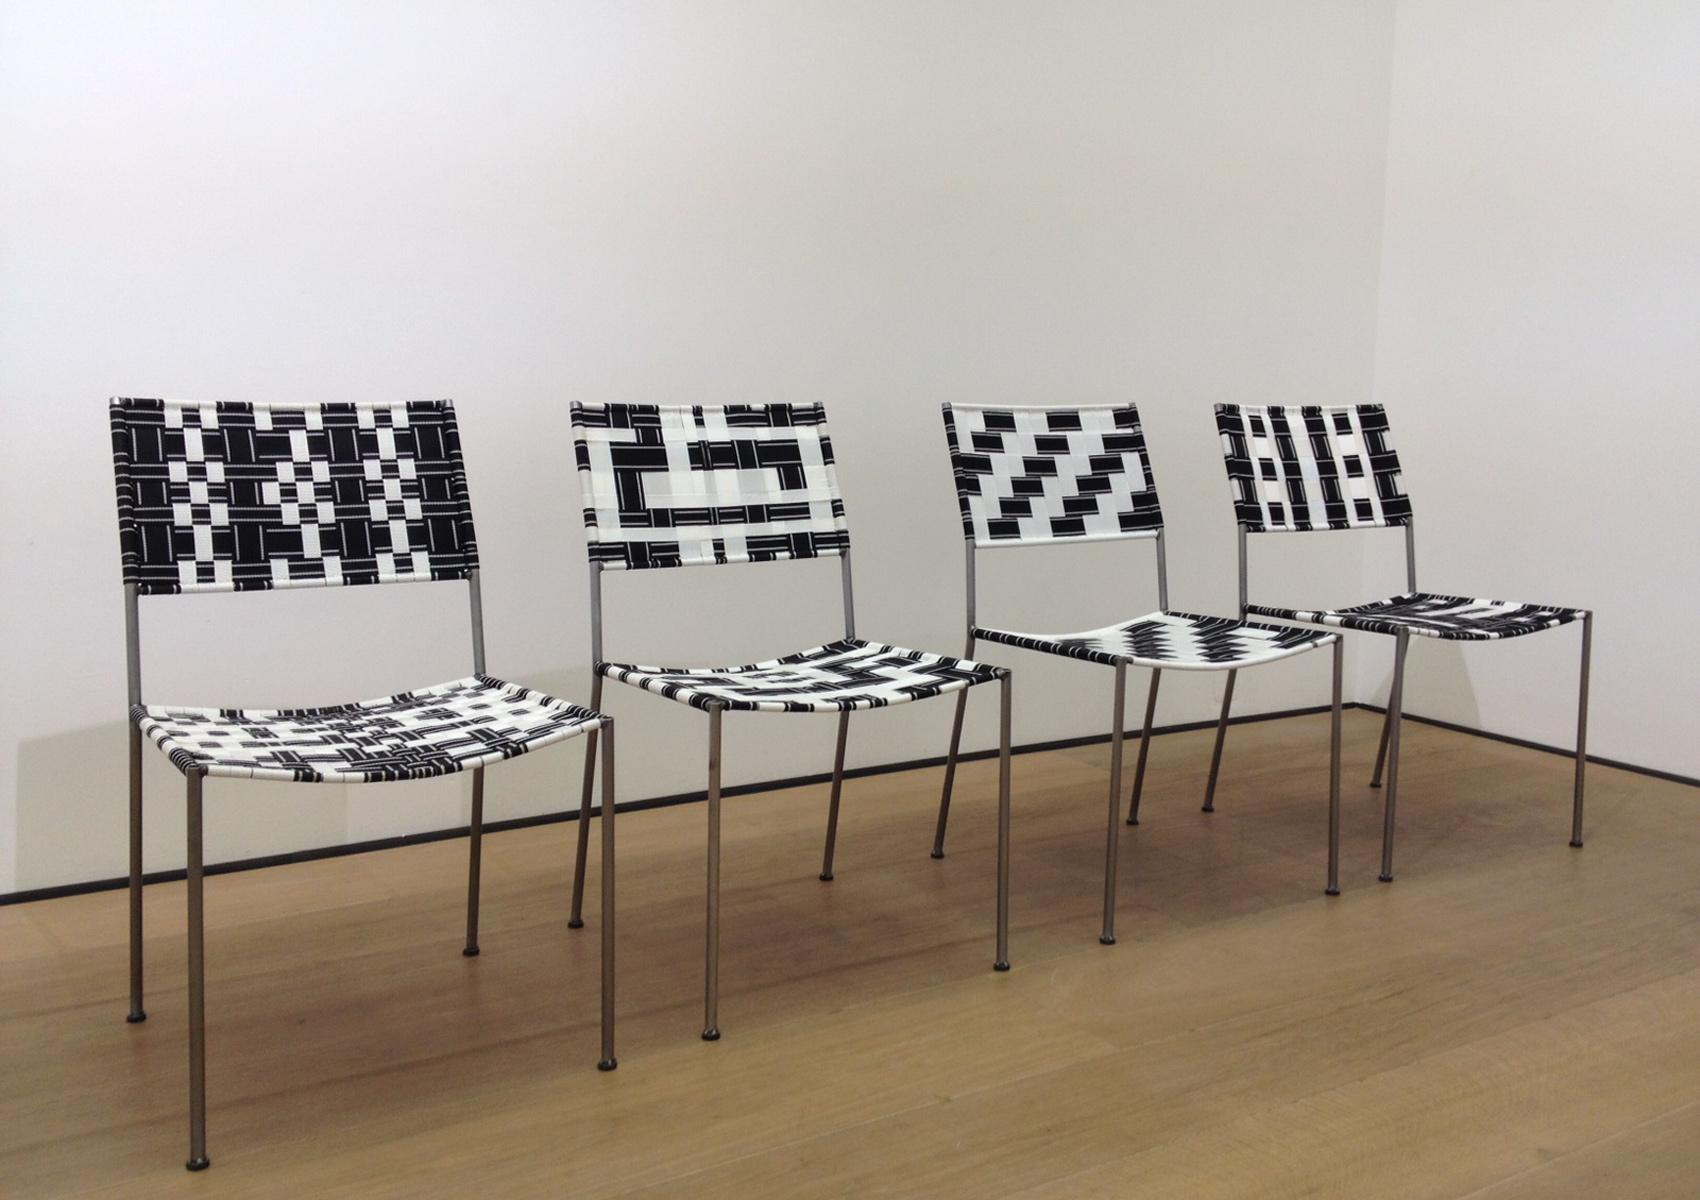 Works - Franz West - Galerie Bärbel Grässlin